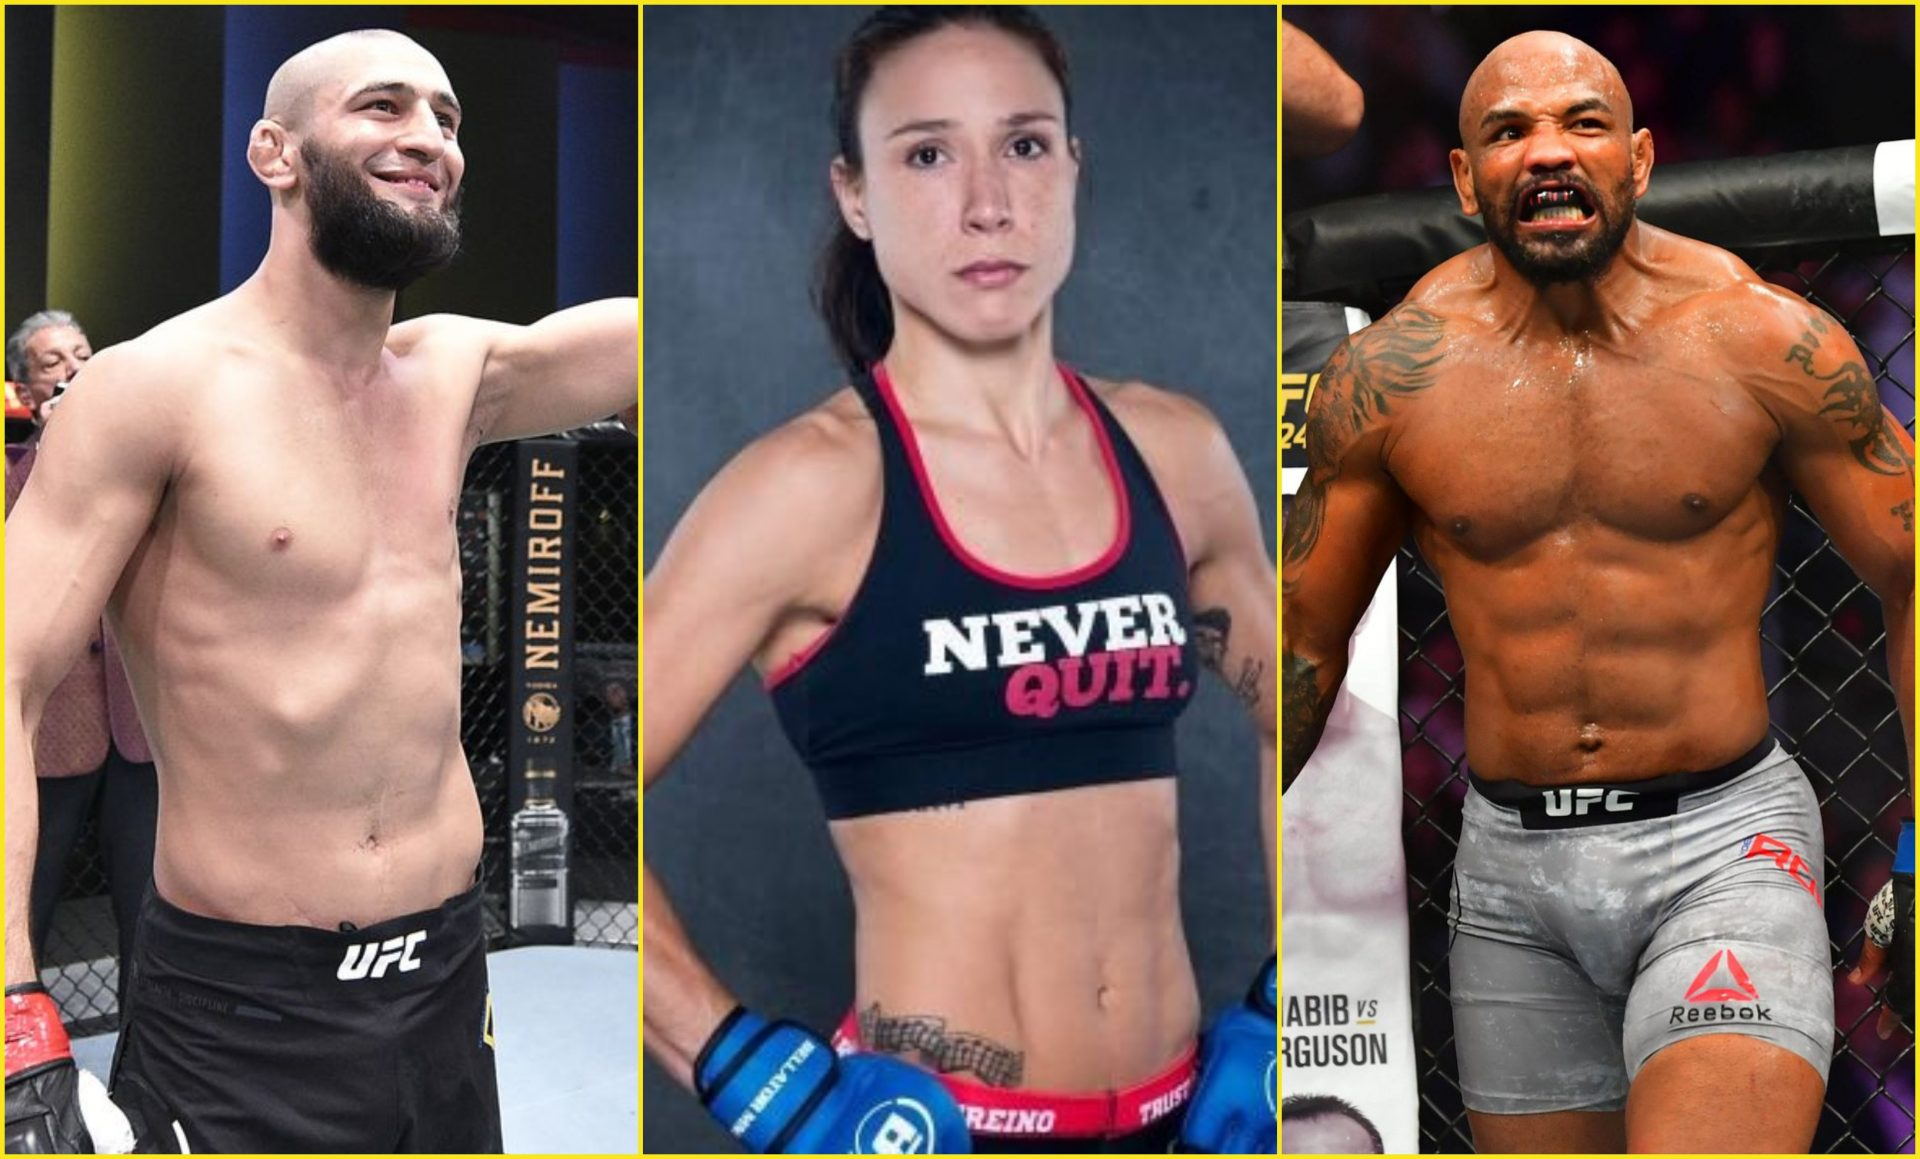 MMA India's Weekly Roundup (8-14th Dec): Yoel Romero fails to draw interest, Bellator has new female flyweight champ and more - romero